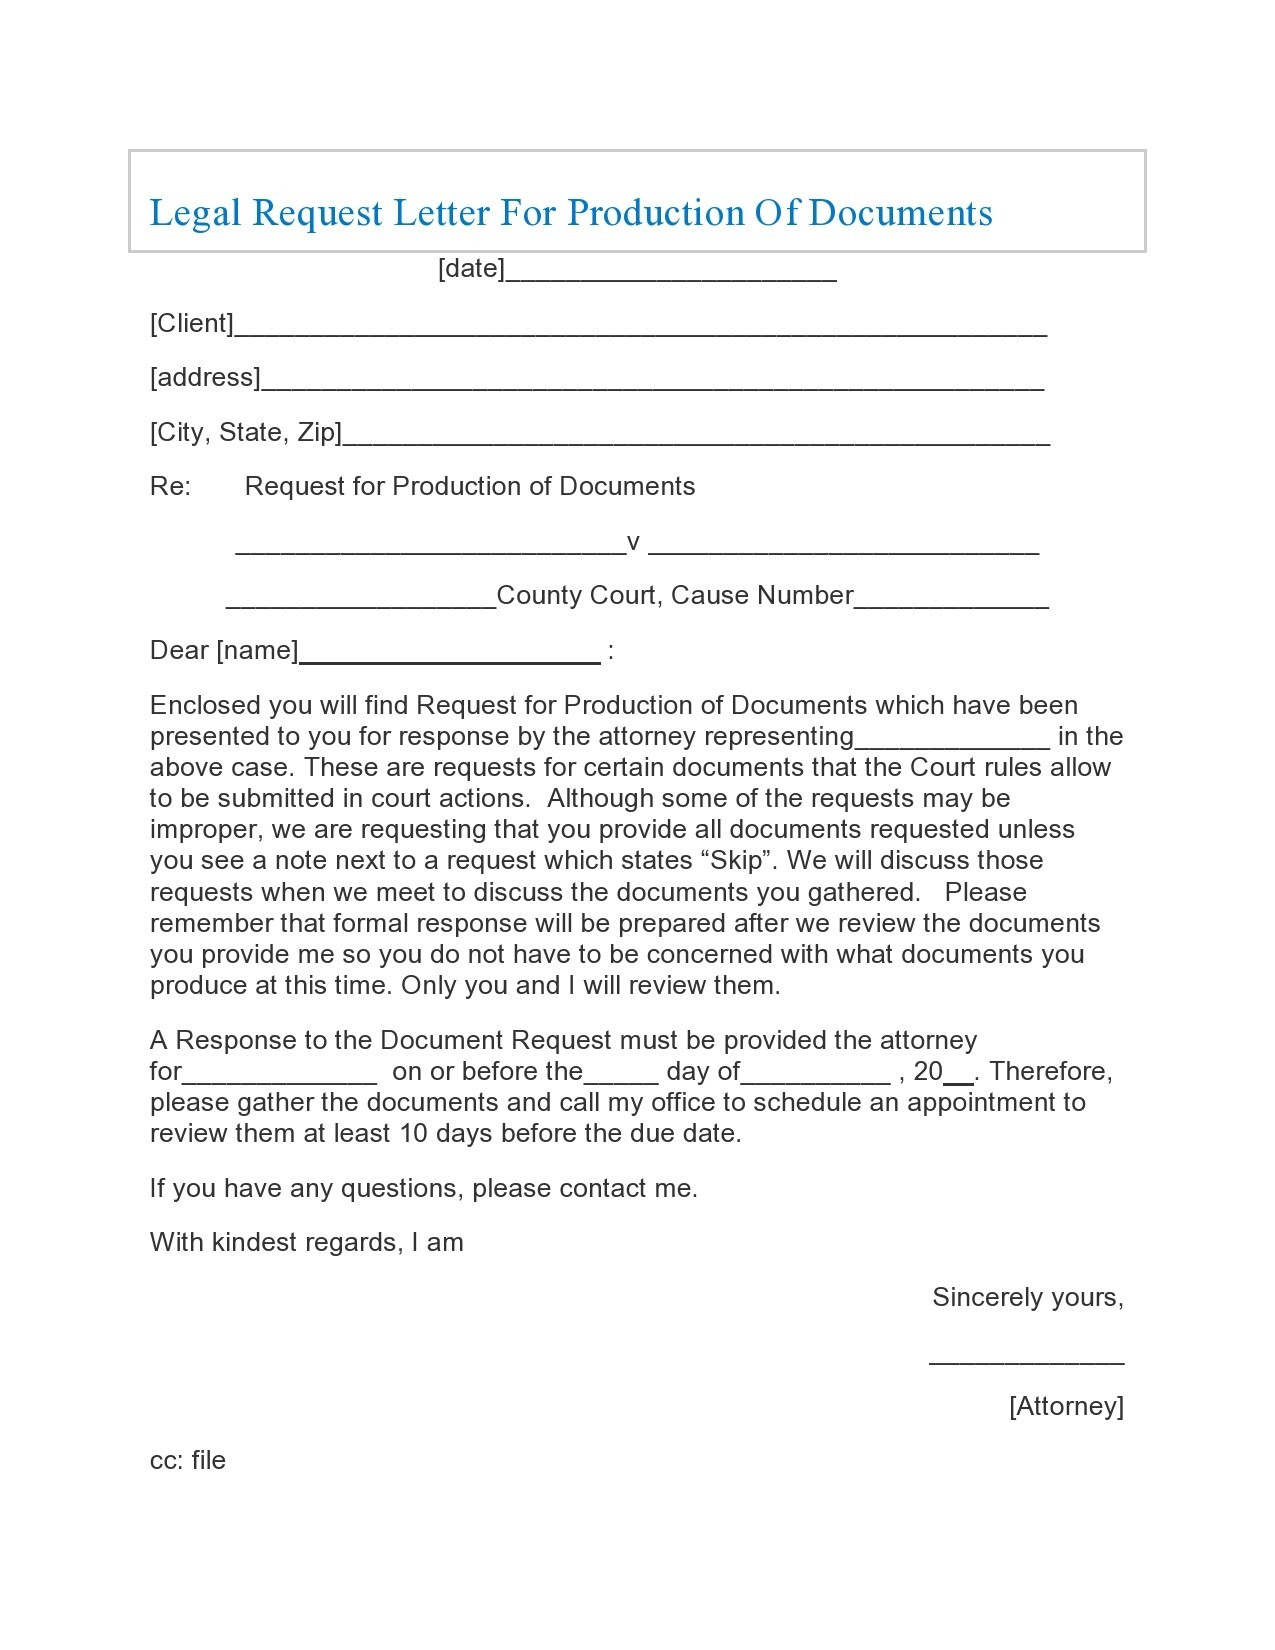 Free legal letter format 37